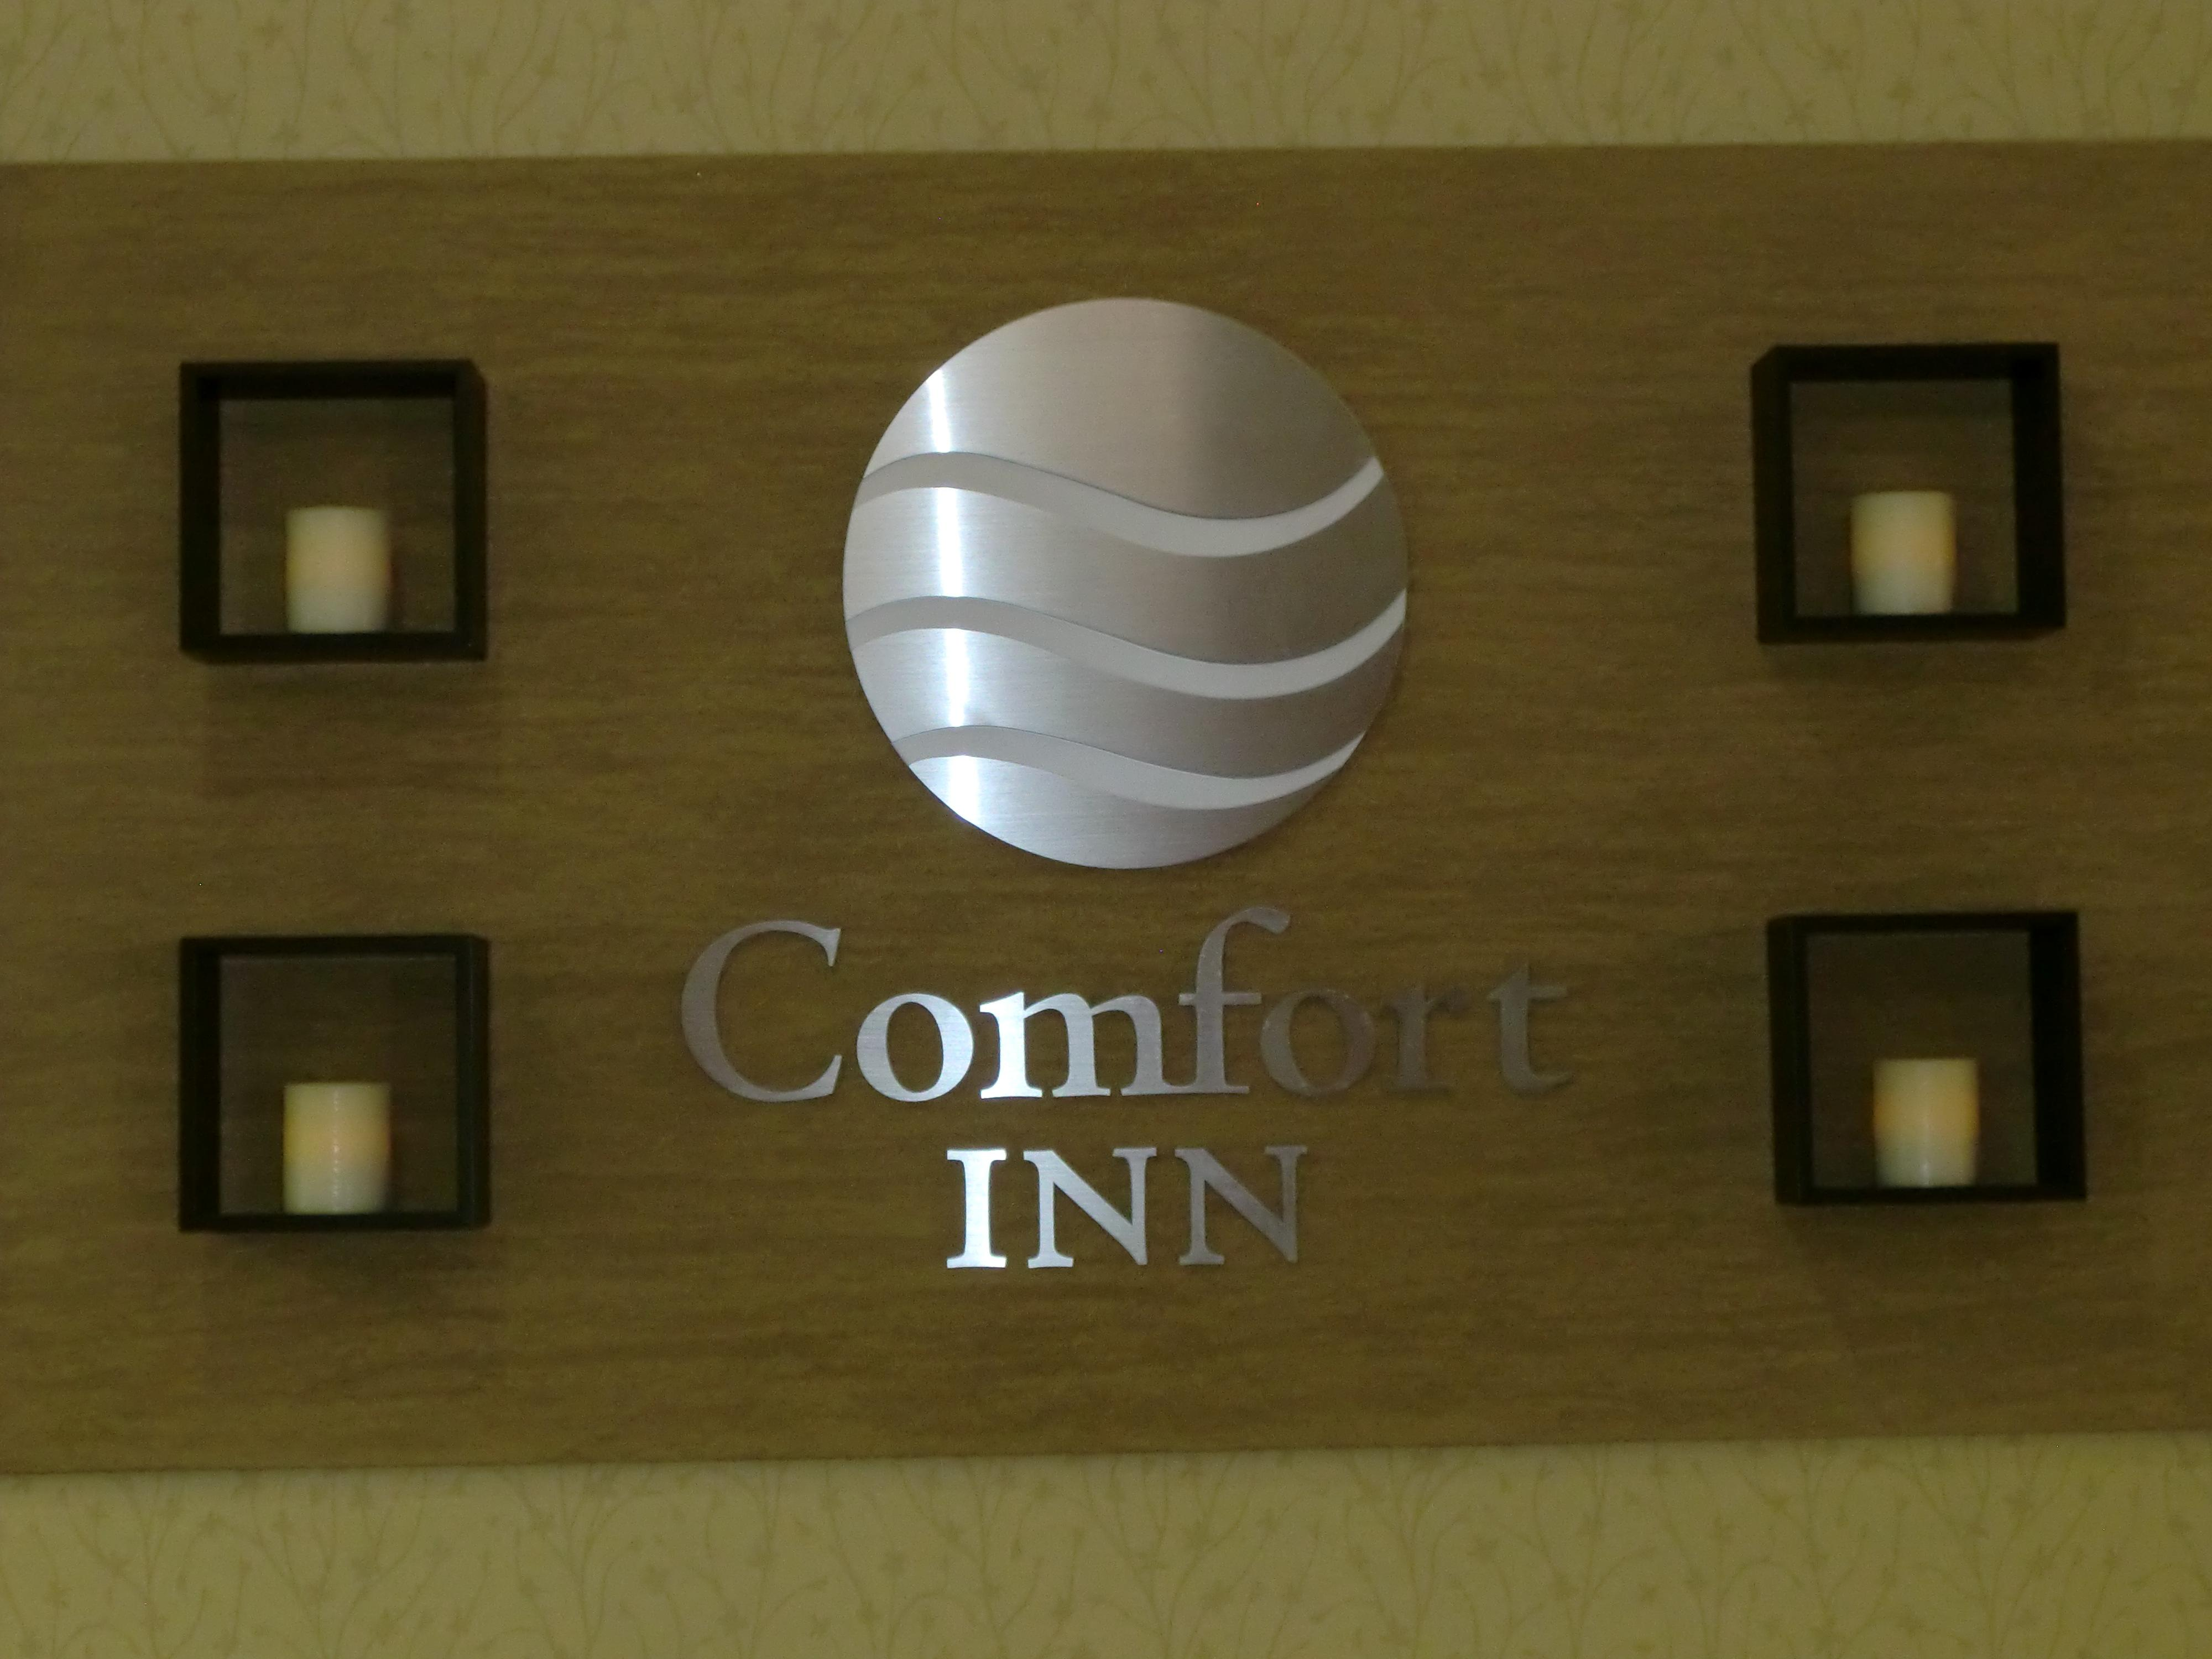 Comfort Inn Birch Run